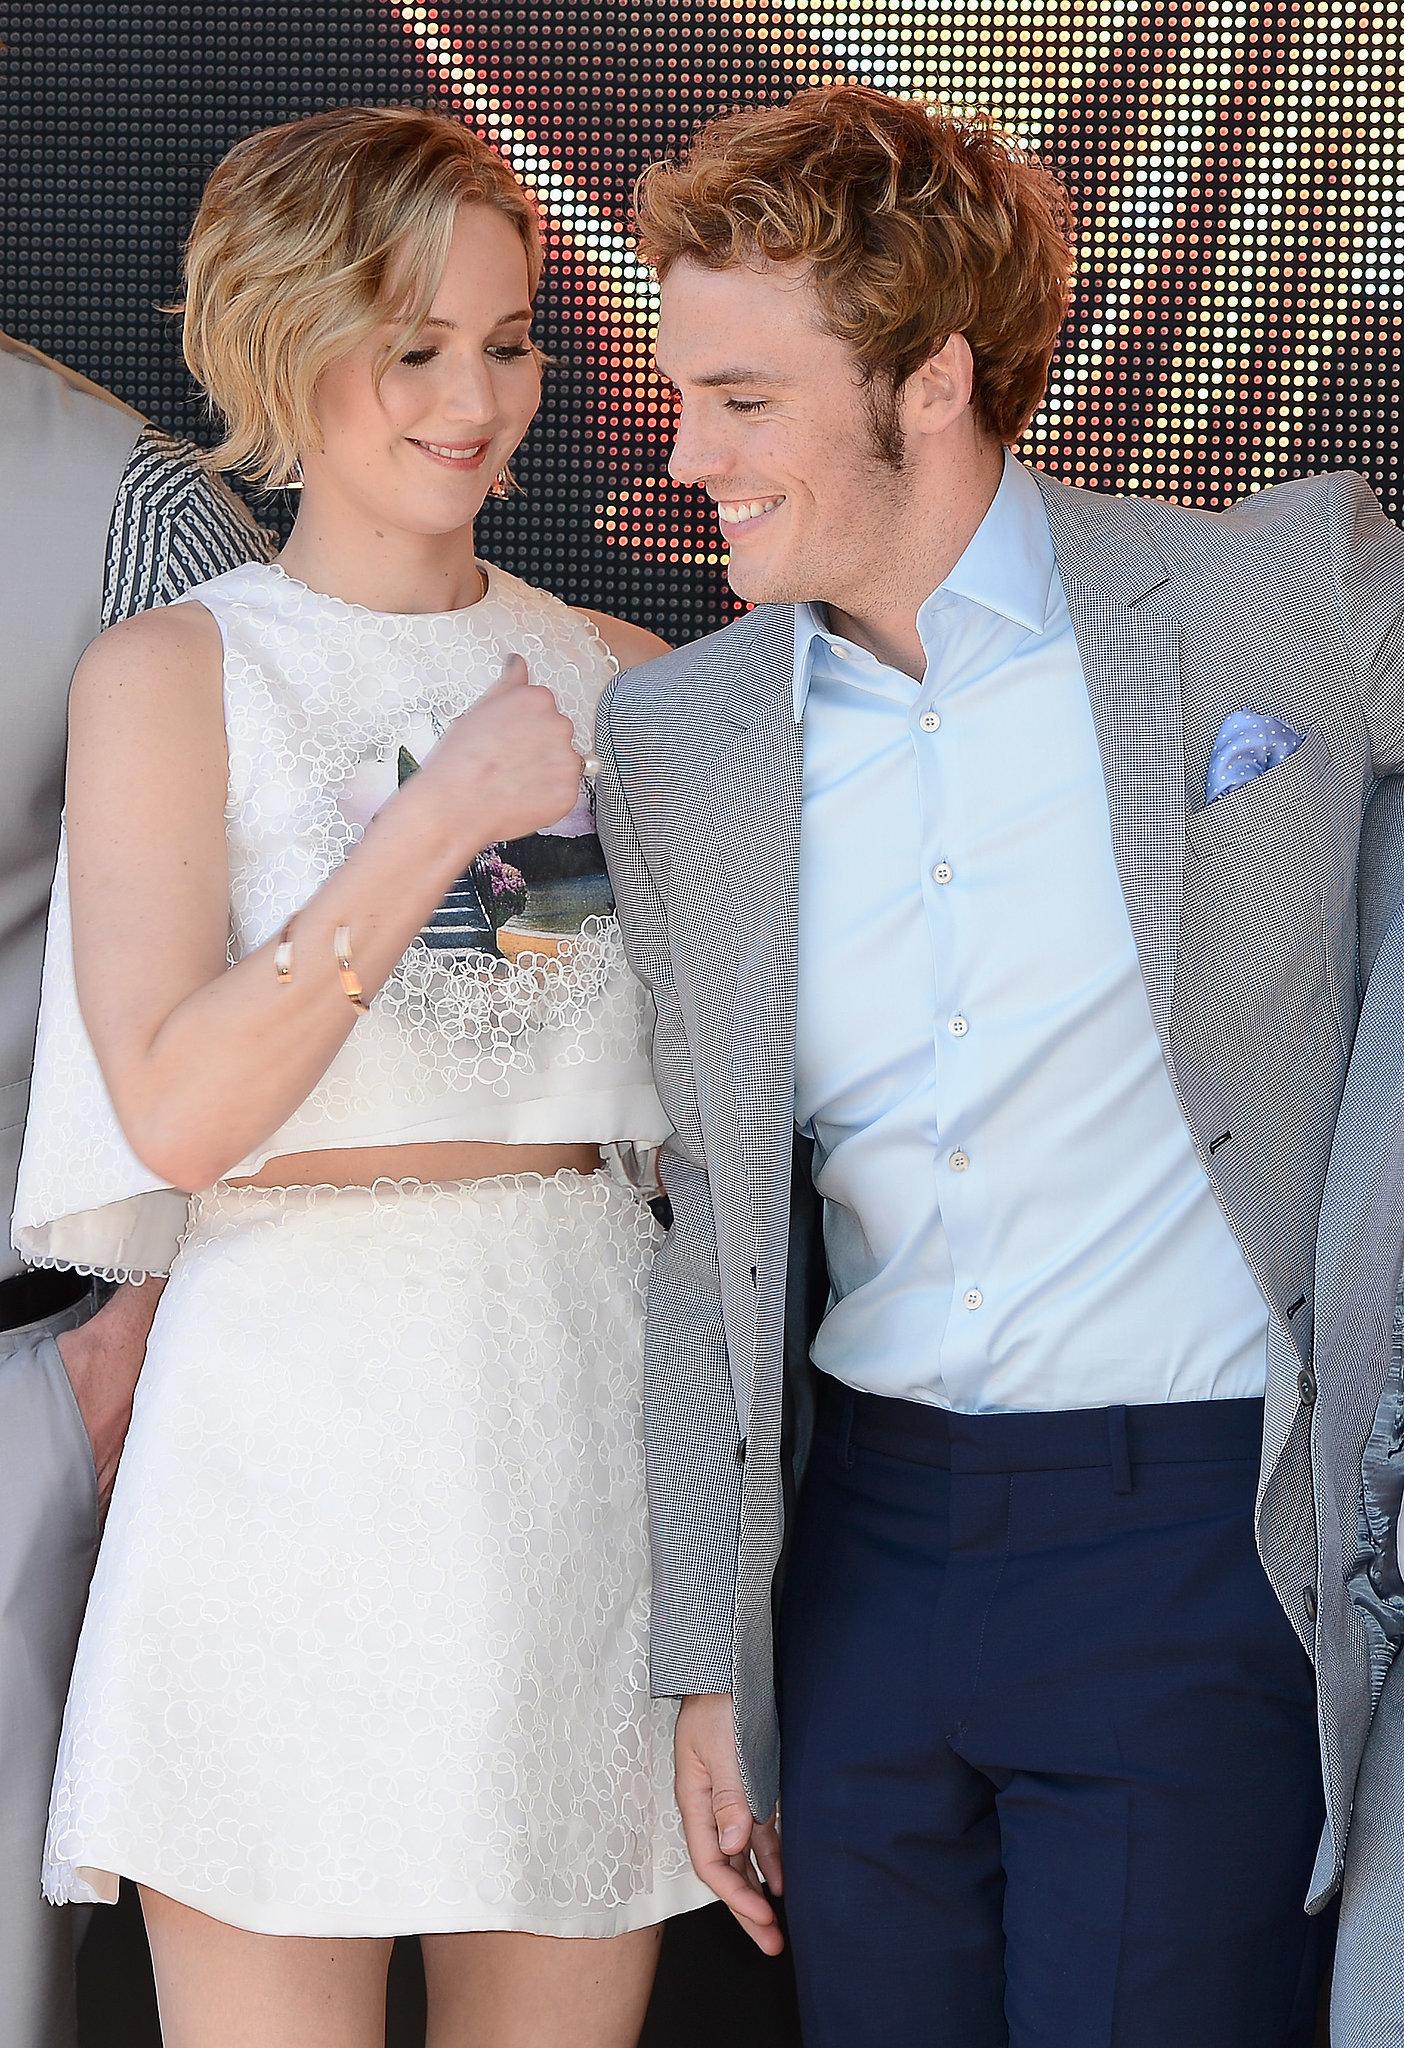 Jennifer and Sam Claflin shared a smiley moment.